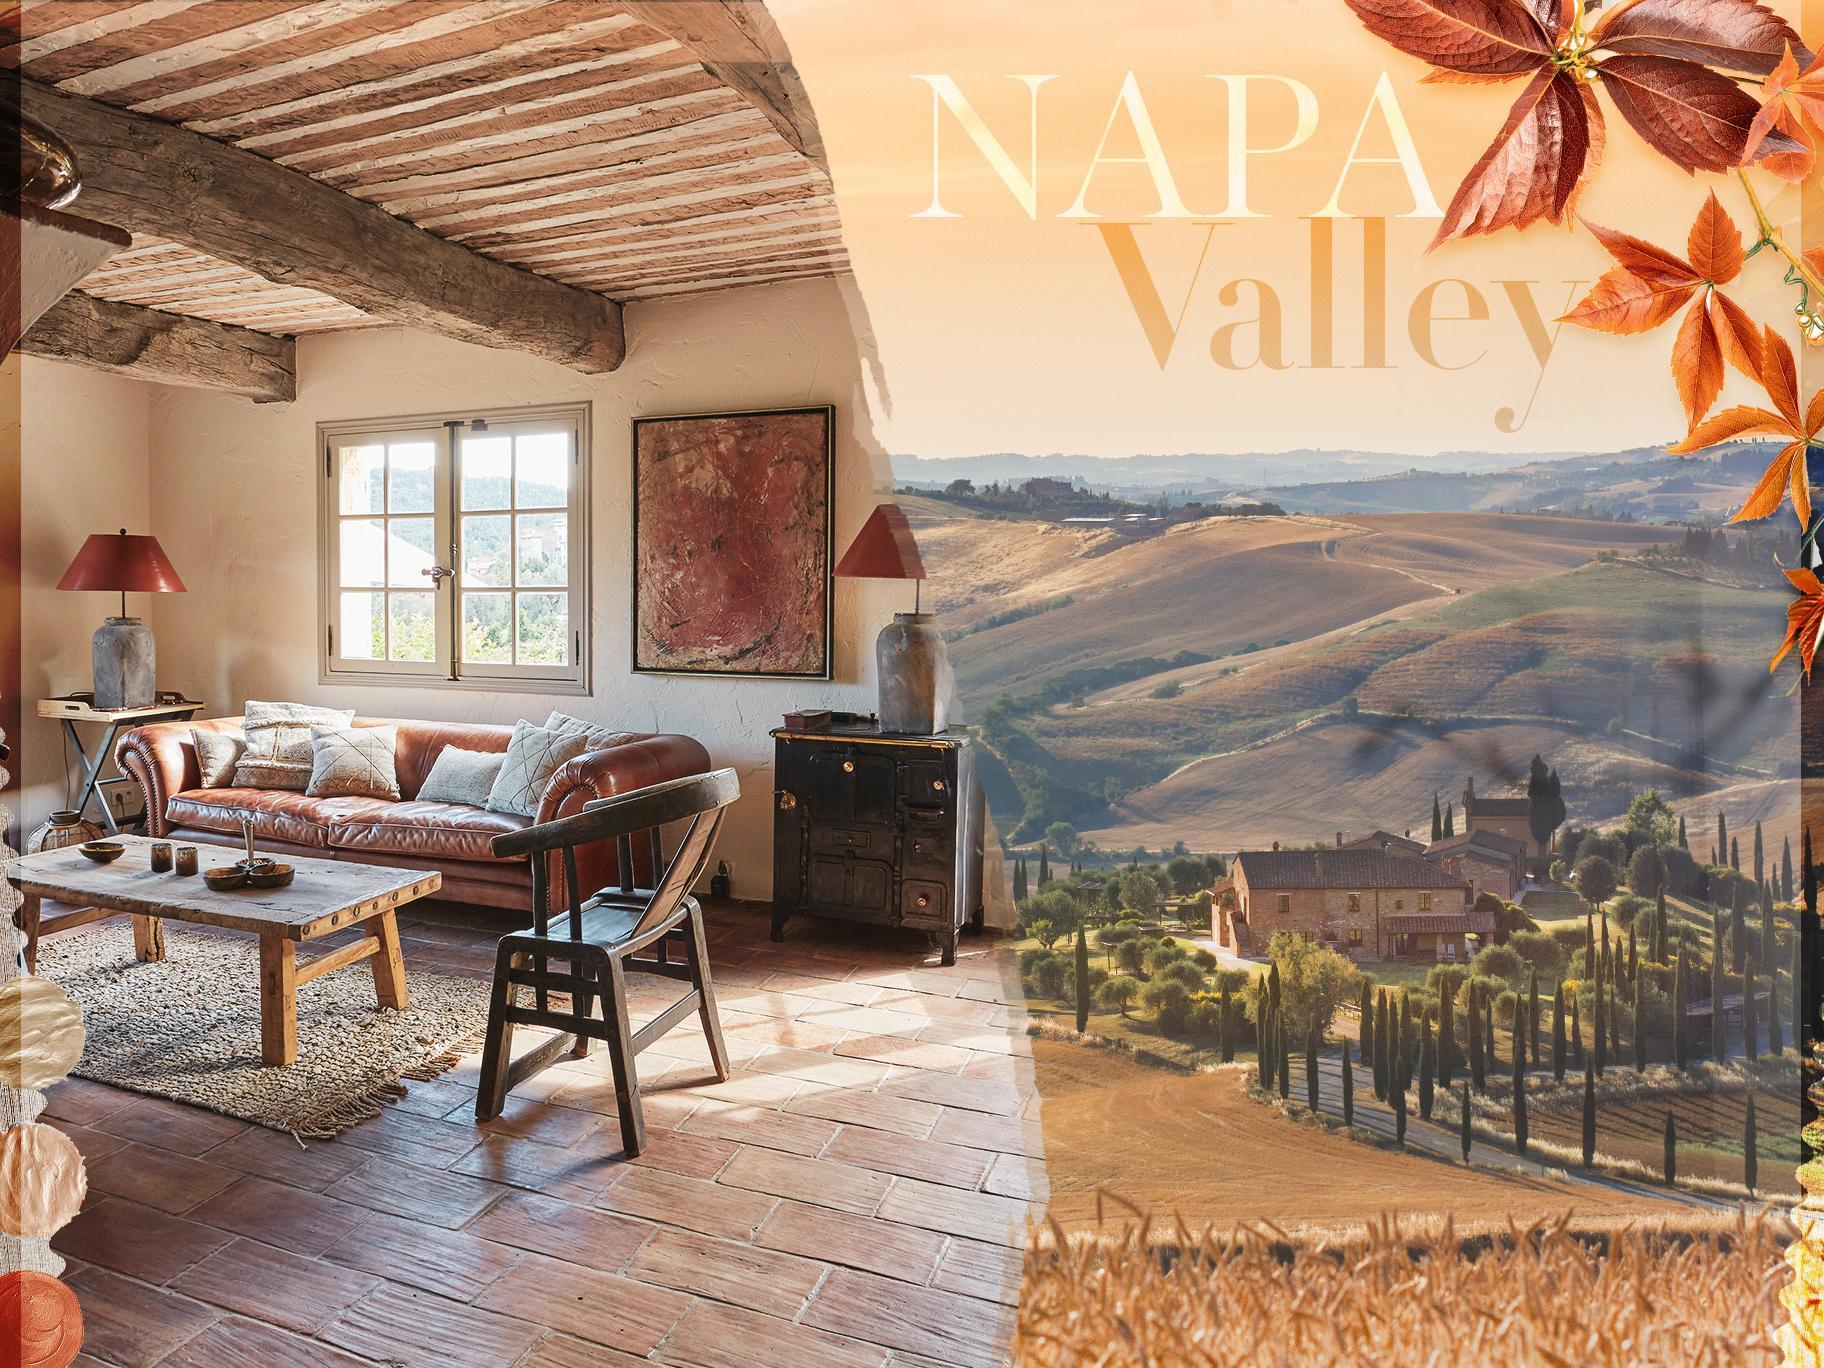 Inspirierendes Napa Valley